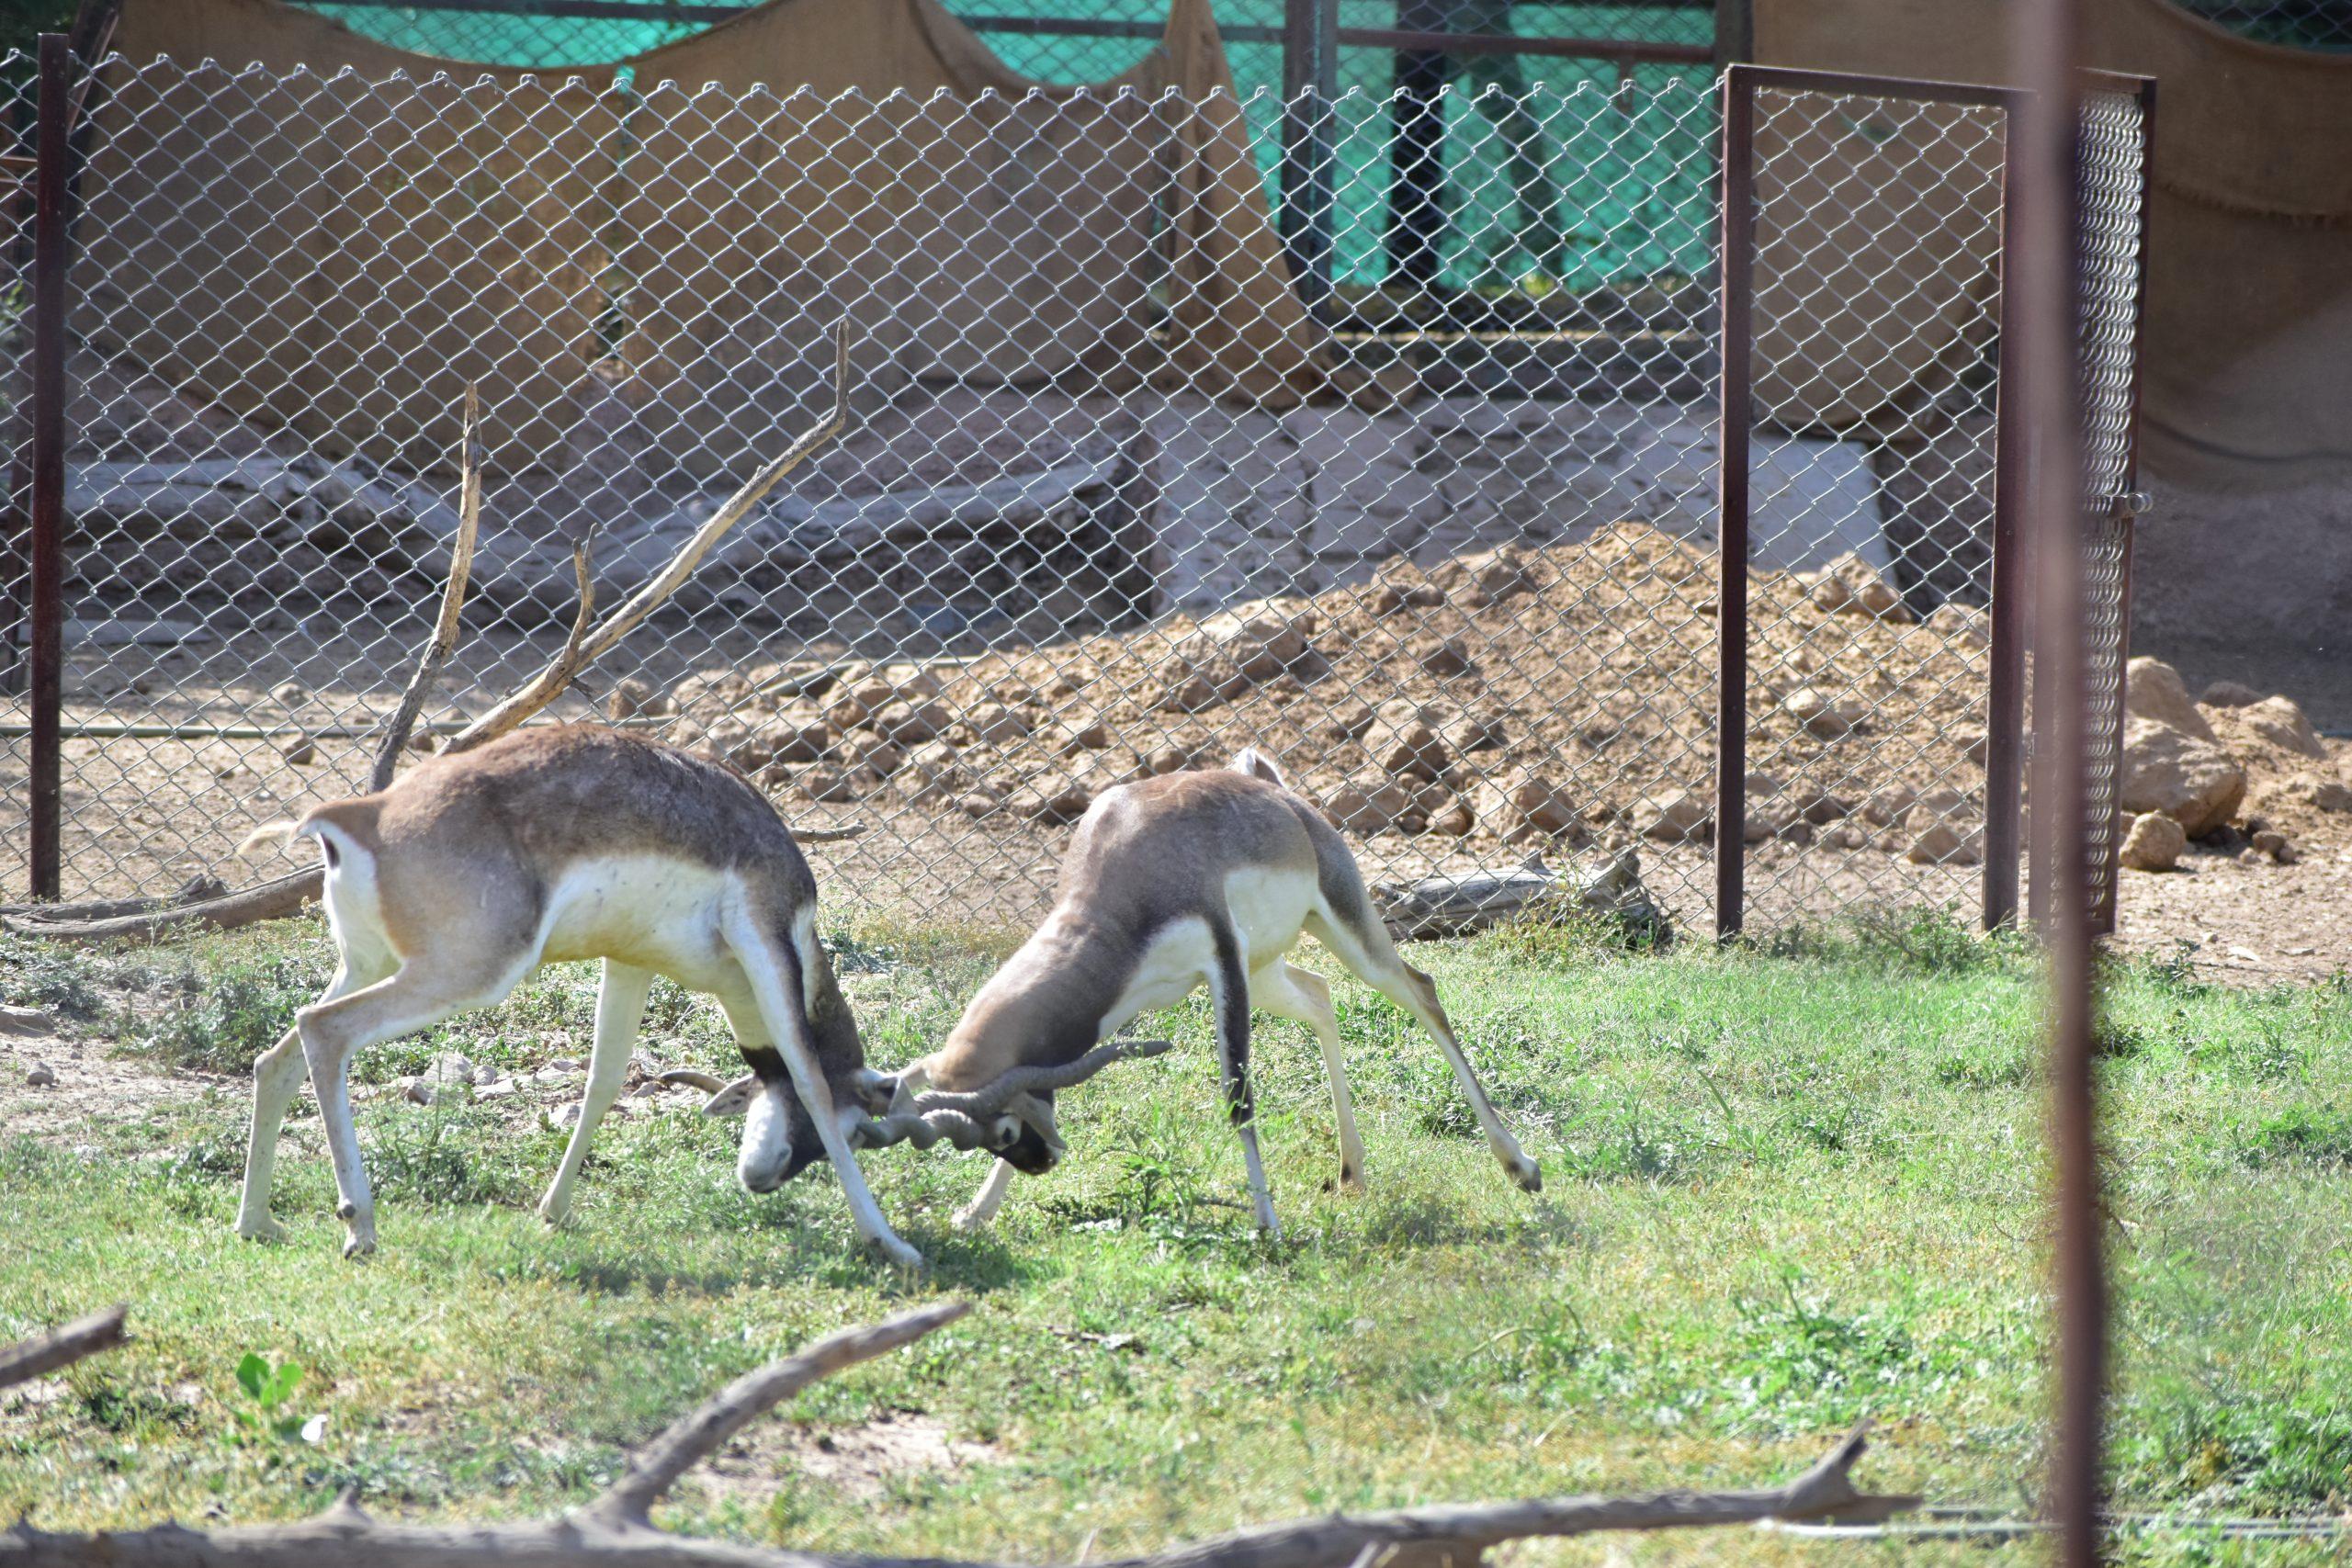 Blackbucks fighting in the steel cage